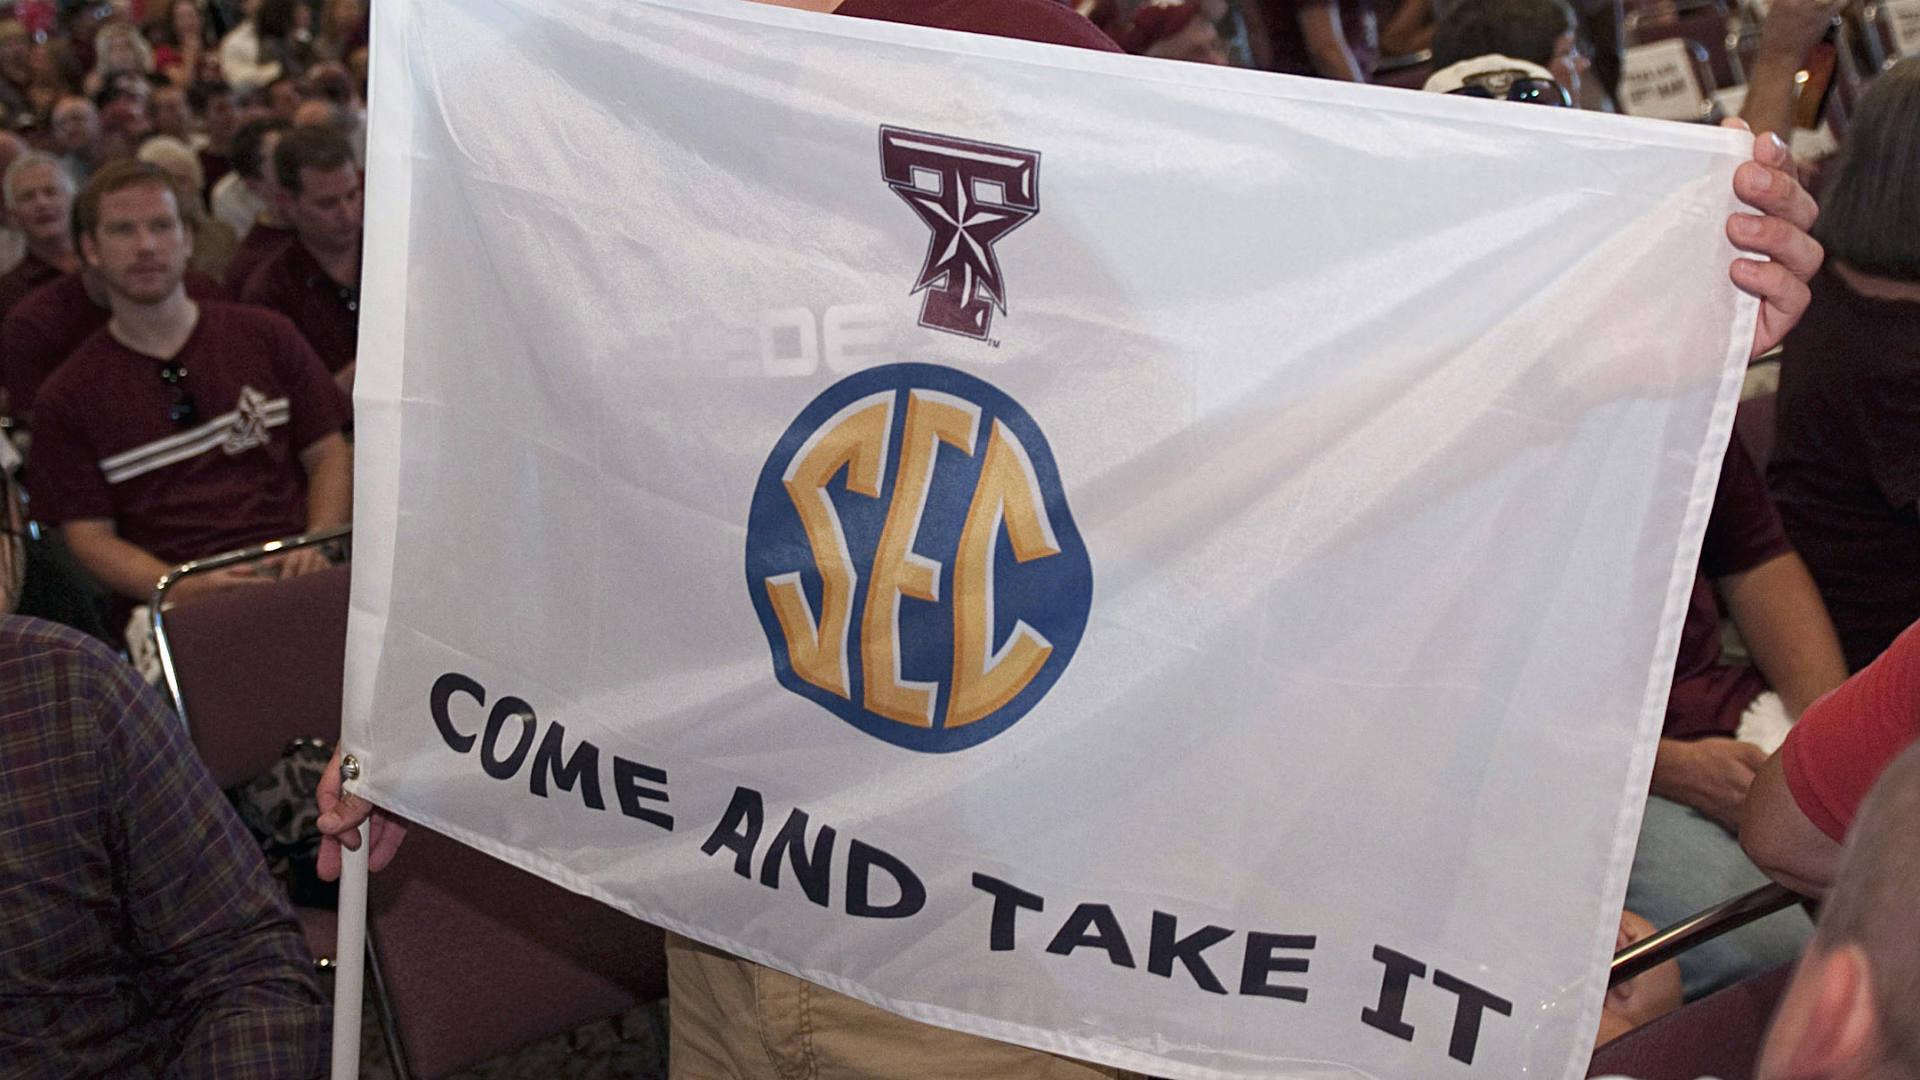 SEC-flag-FTR-052714-AP